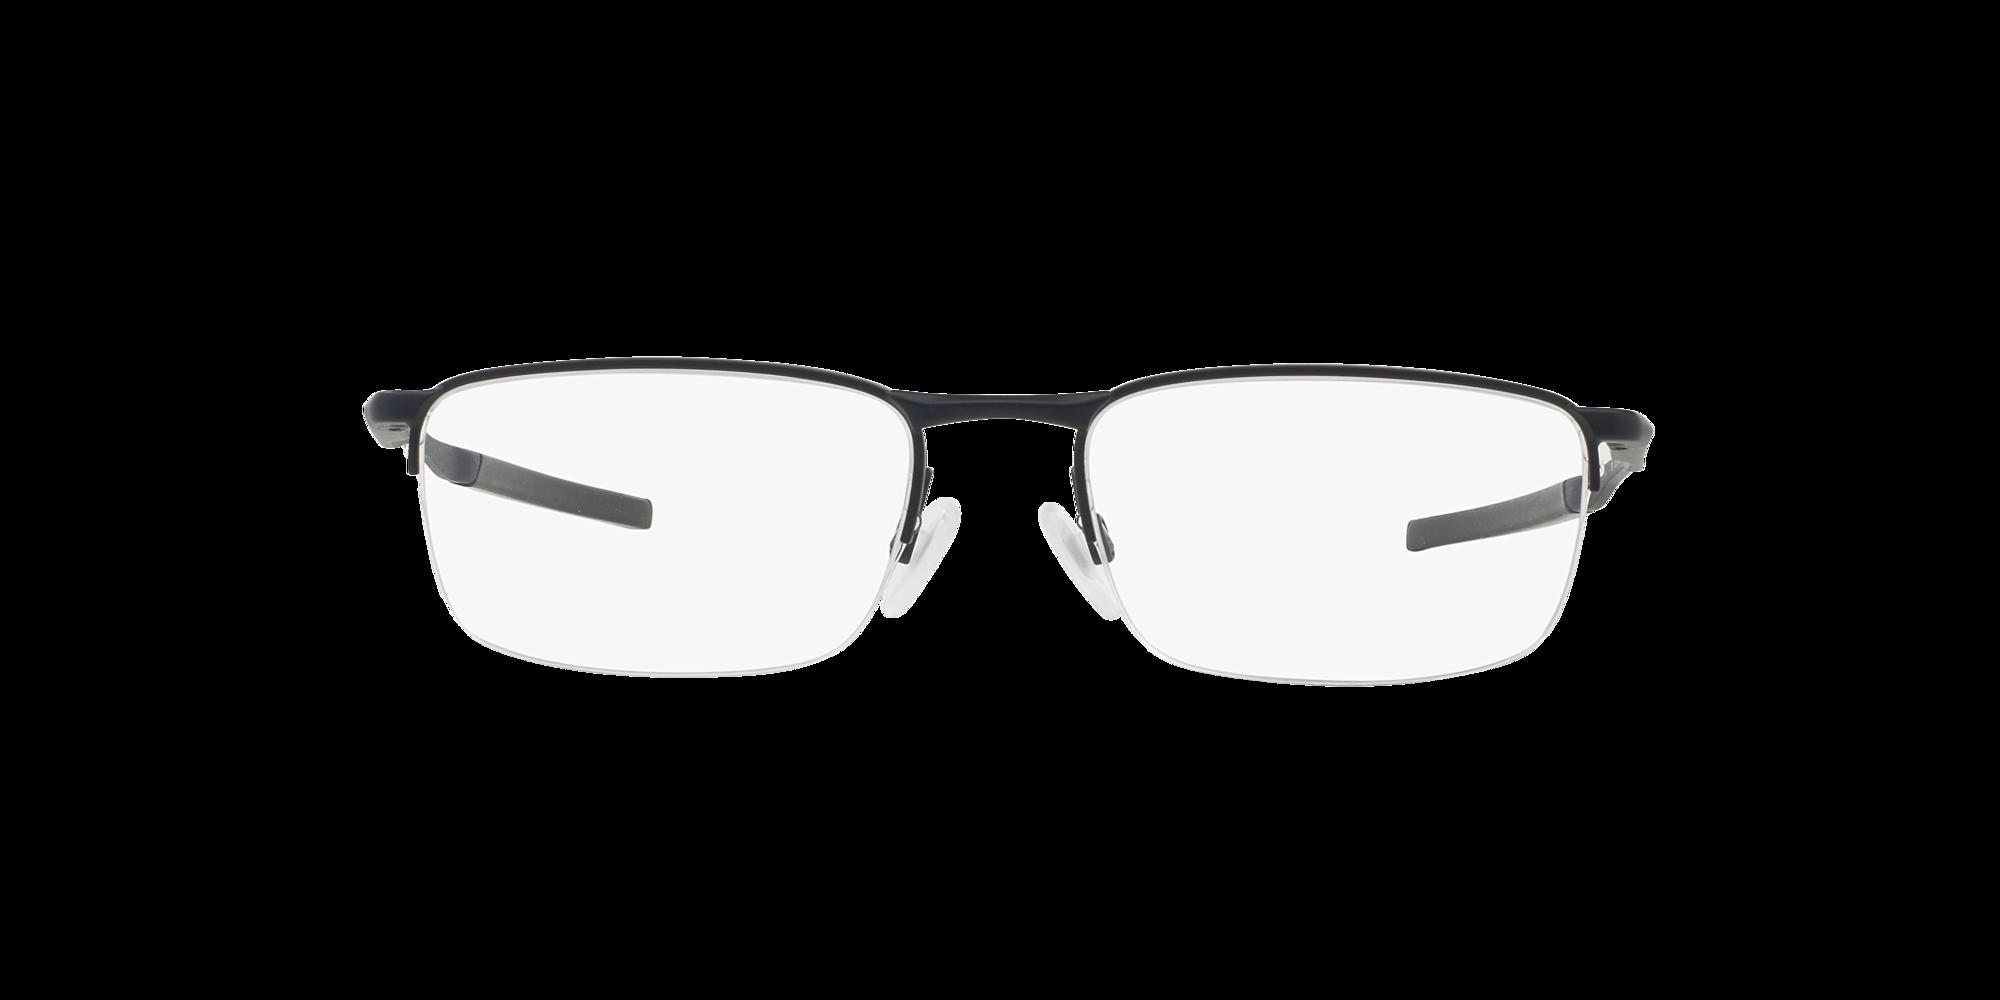 Image for OX3174 BARRELHOUSE 0 from LensCrafters | Glasses, Prescription Glasses Online, Eyewear